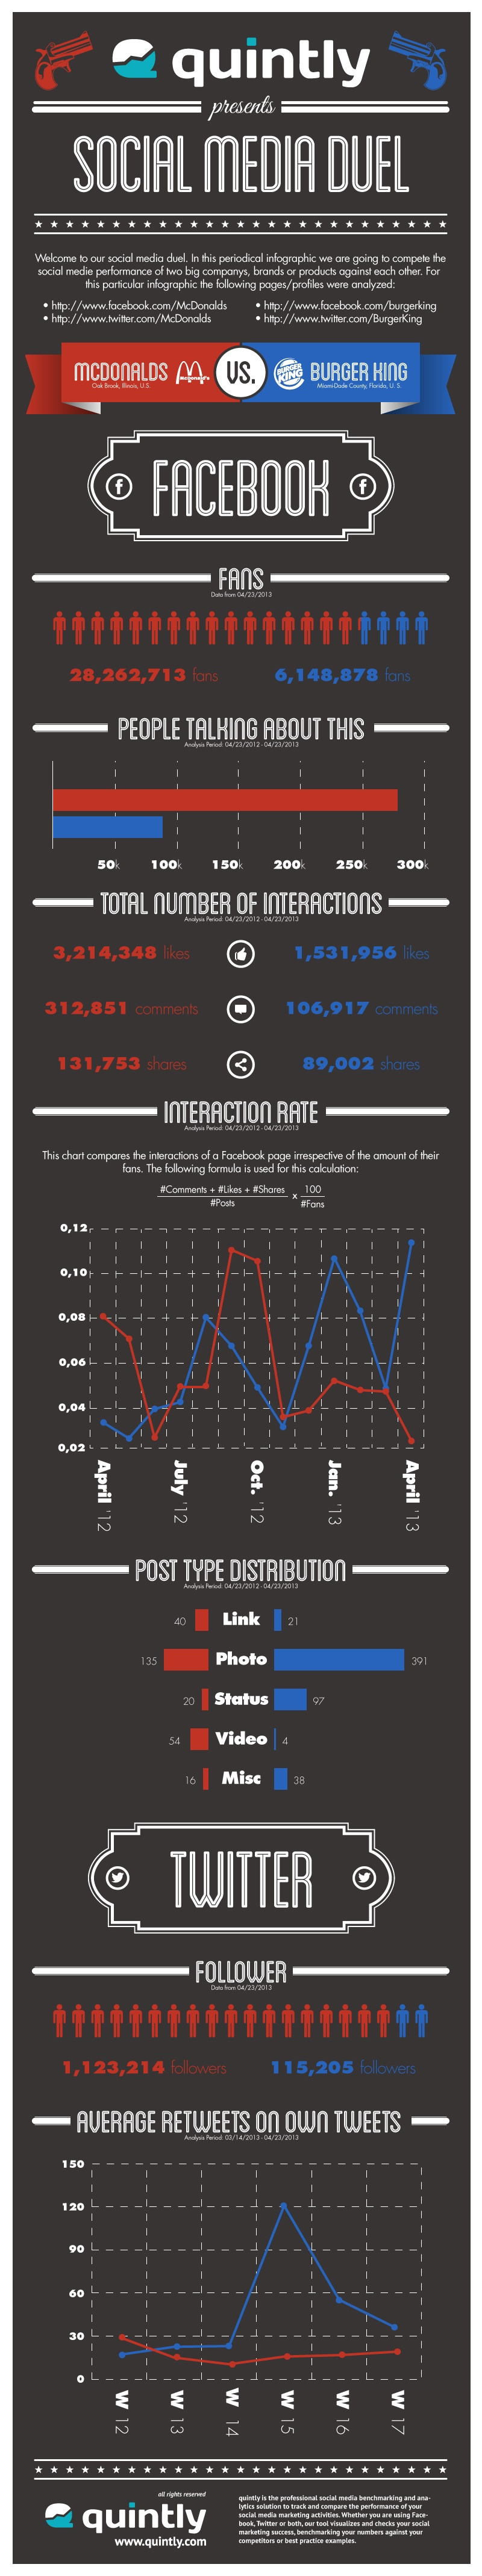 quintly Infographic: Social Media Duel - McDonalds Vs. Burger King